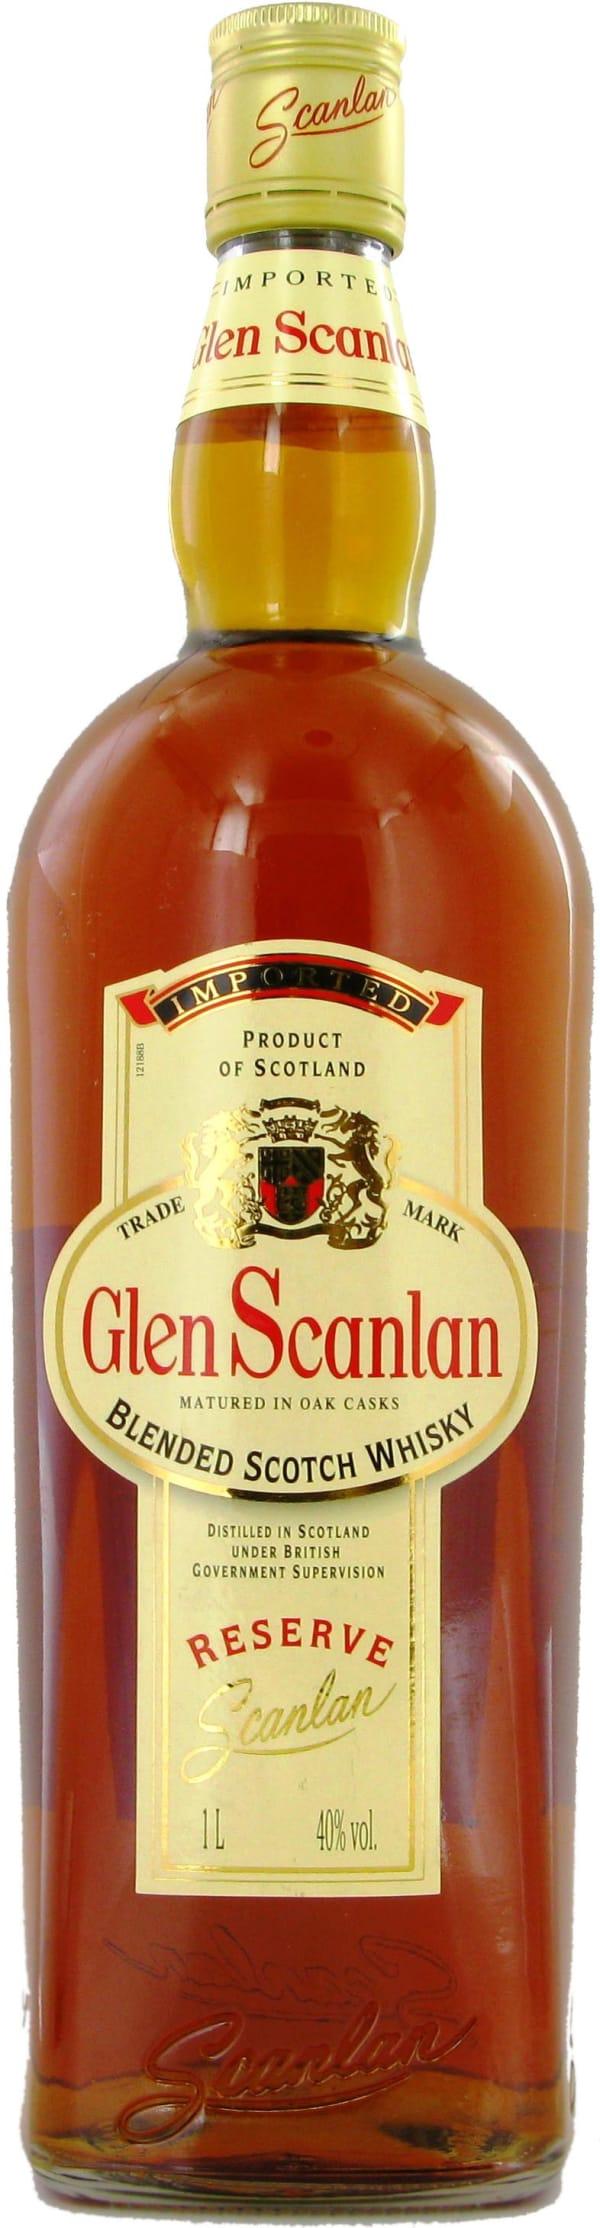 Glen Scanlan